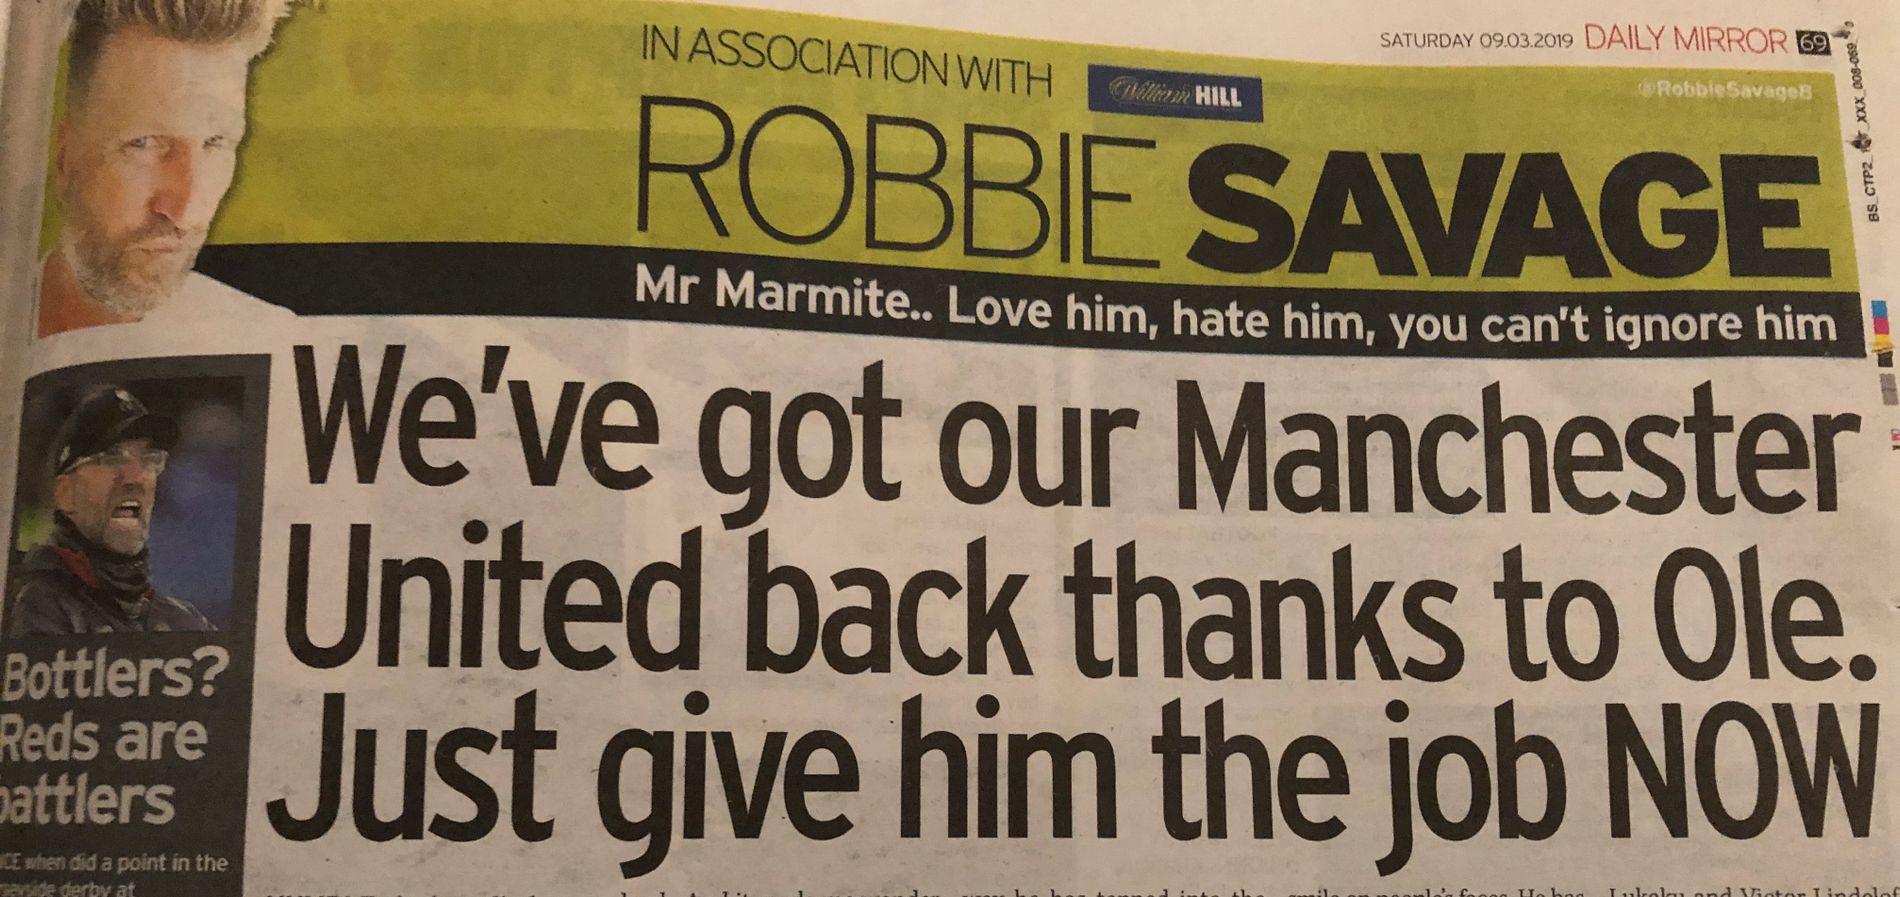 ANSETT NÅ: Det mener Robbie Savage i Mirror.